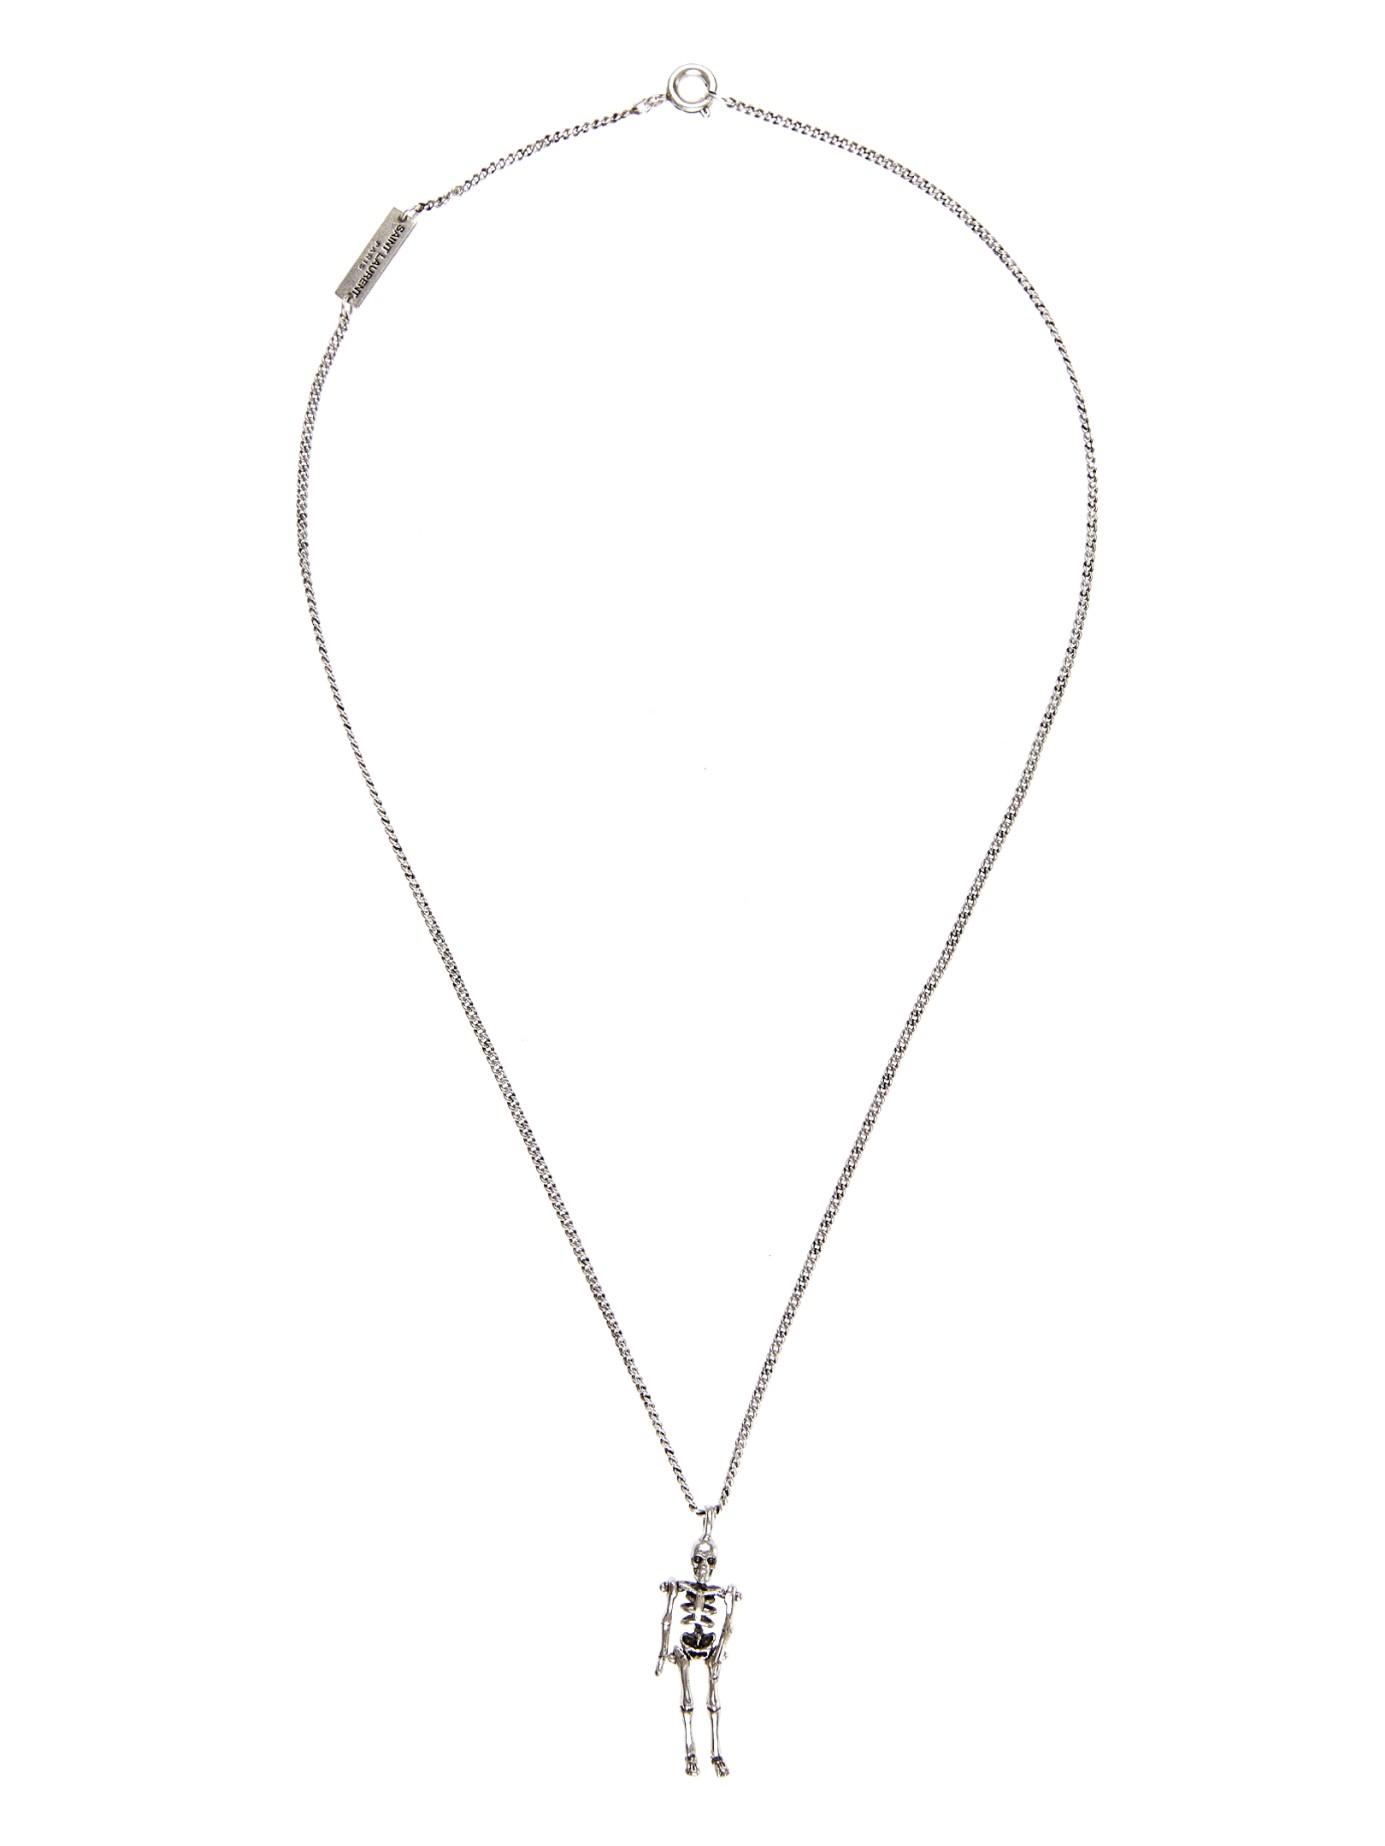 539da424271 Saint Laurent Punk Skeleton Necklace in Metallic - Lyst